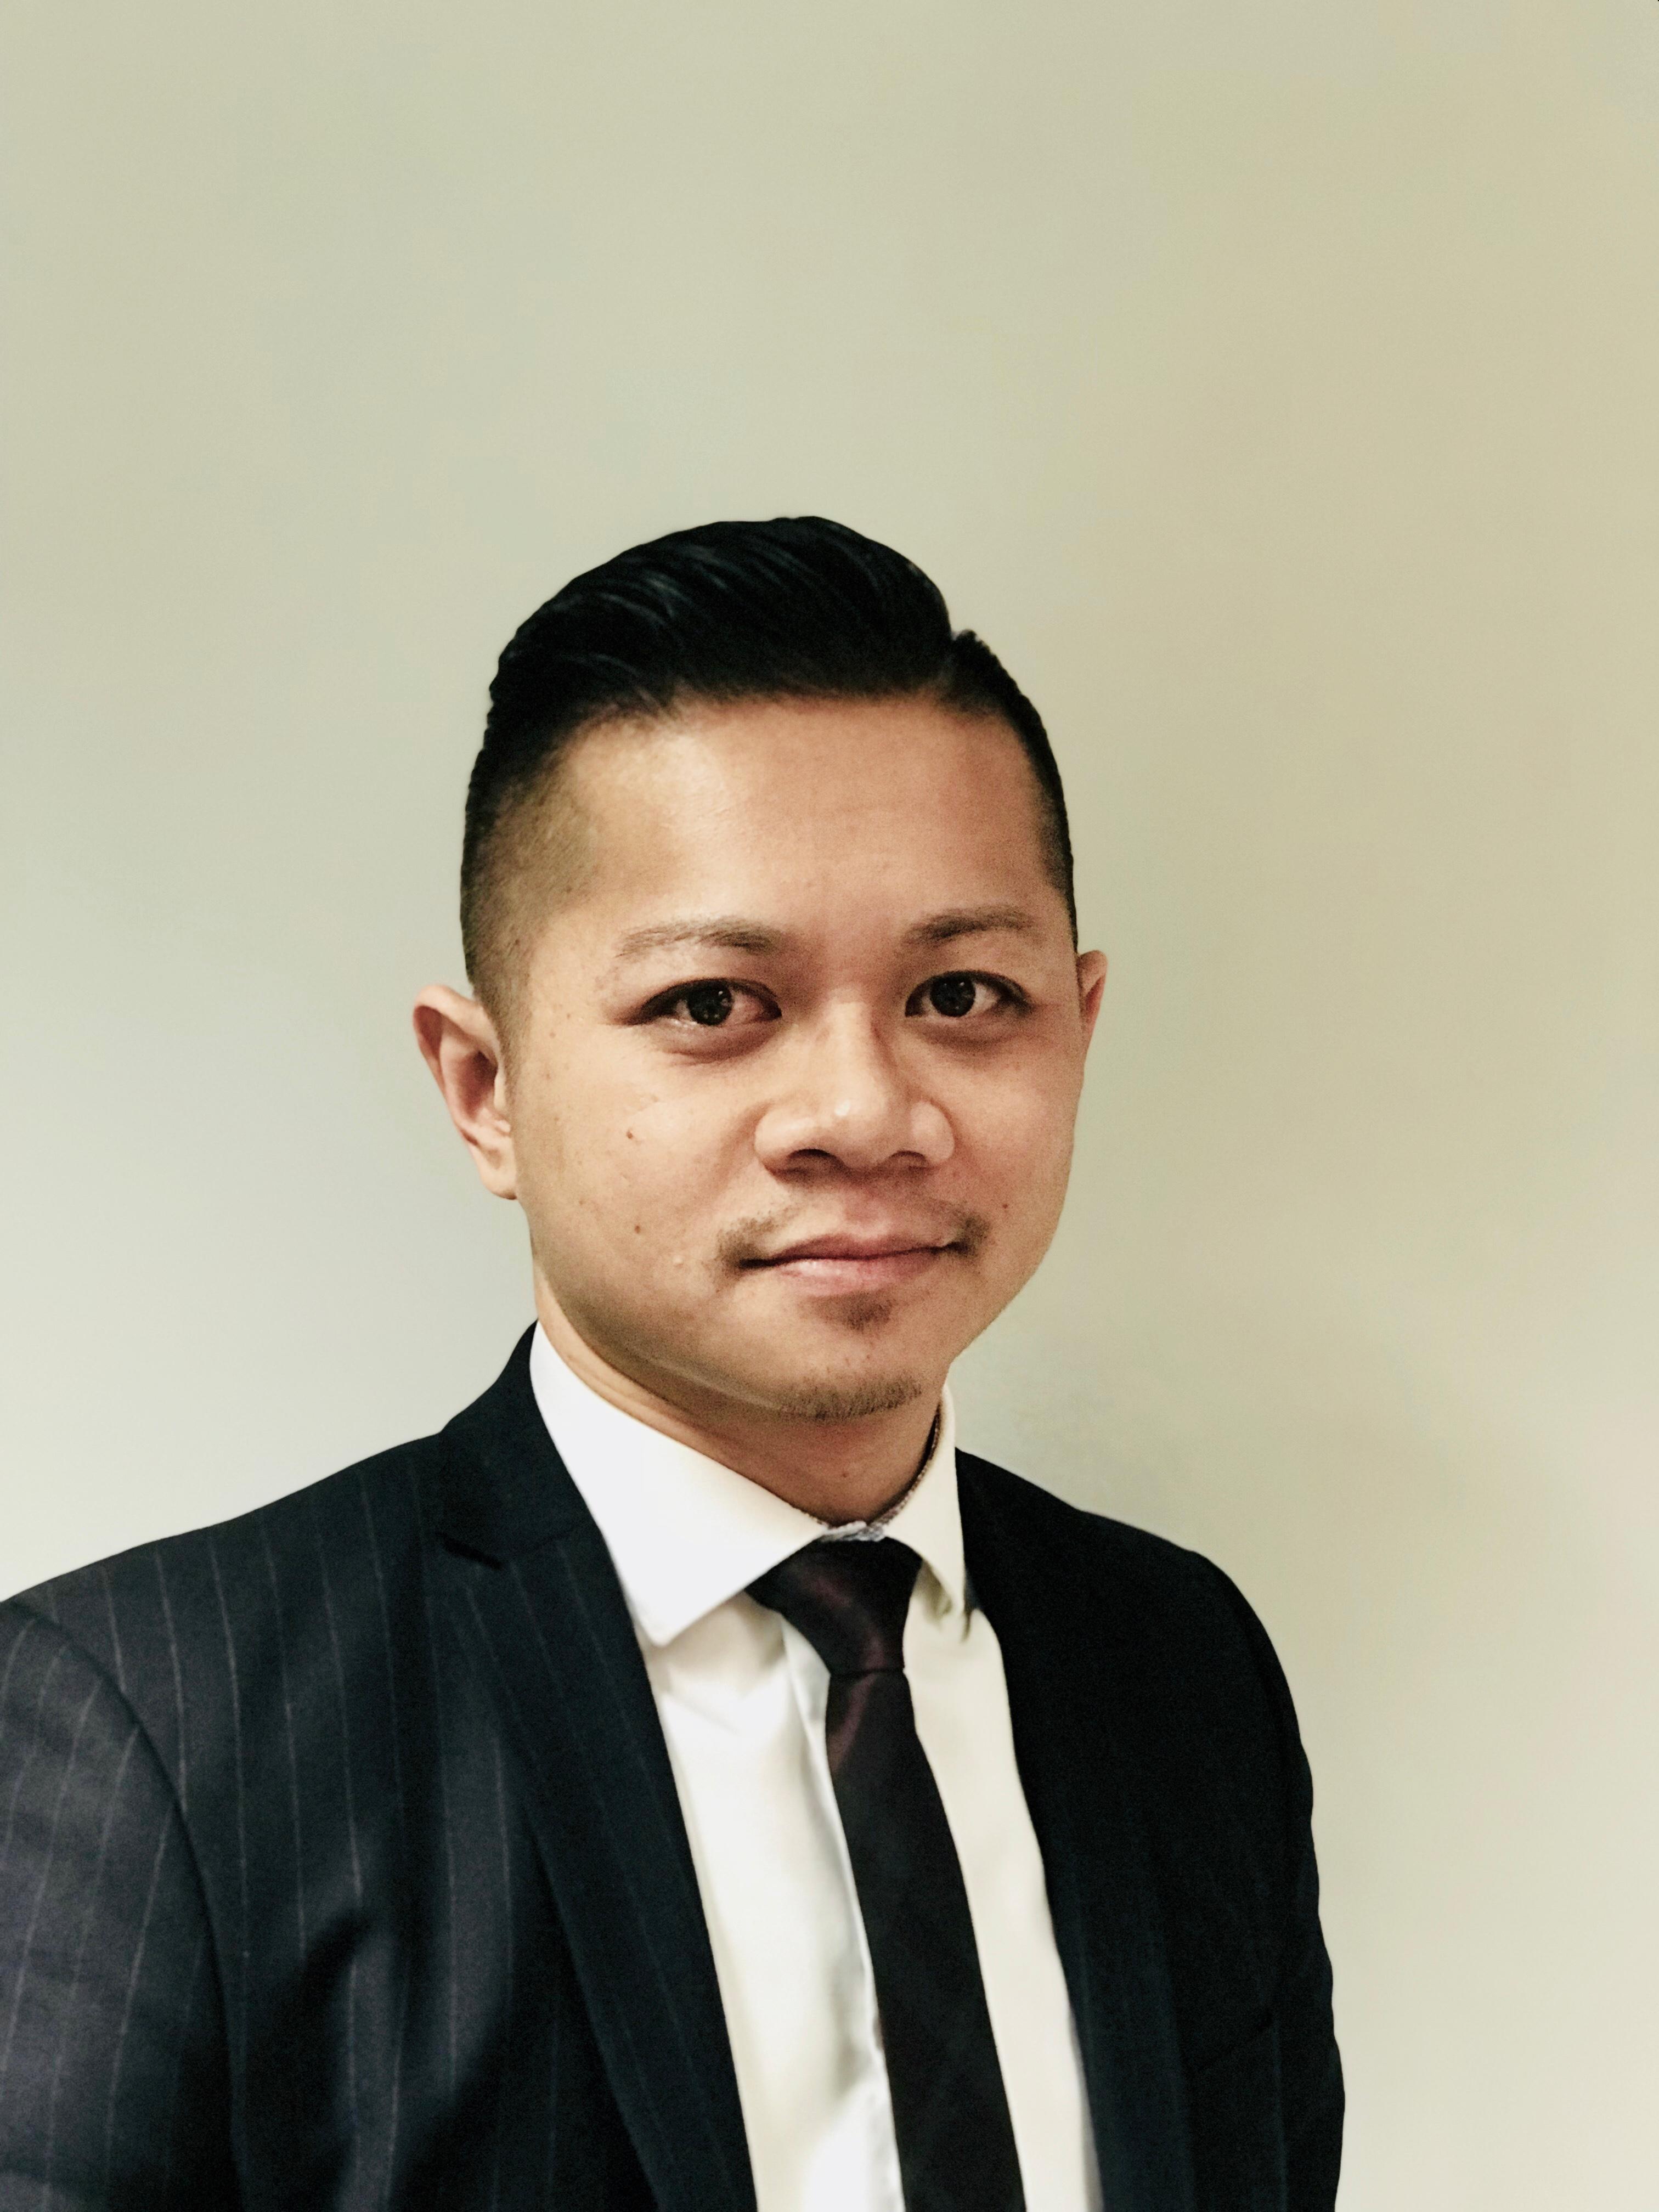 LEONARD NGUYEN  Your Financial Professional & Insurance Agent